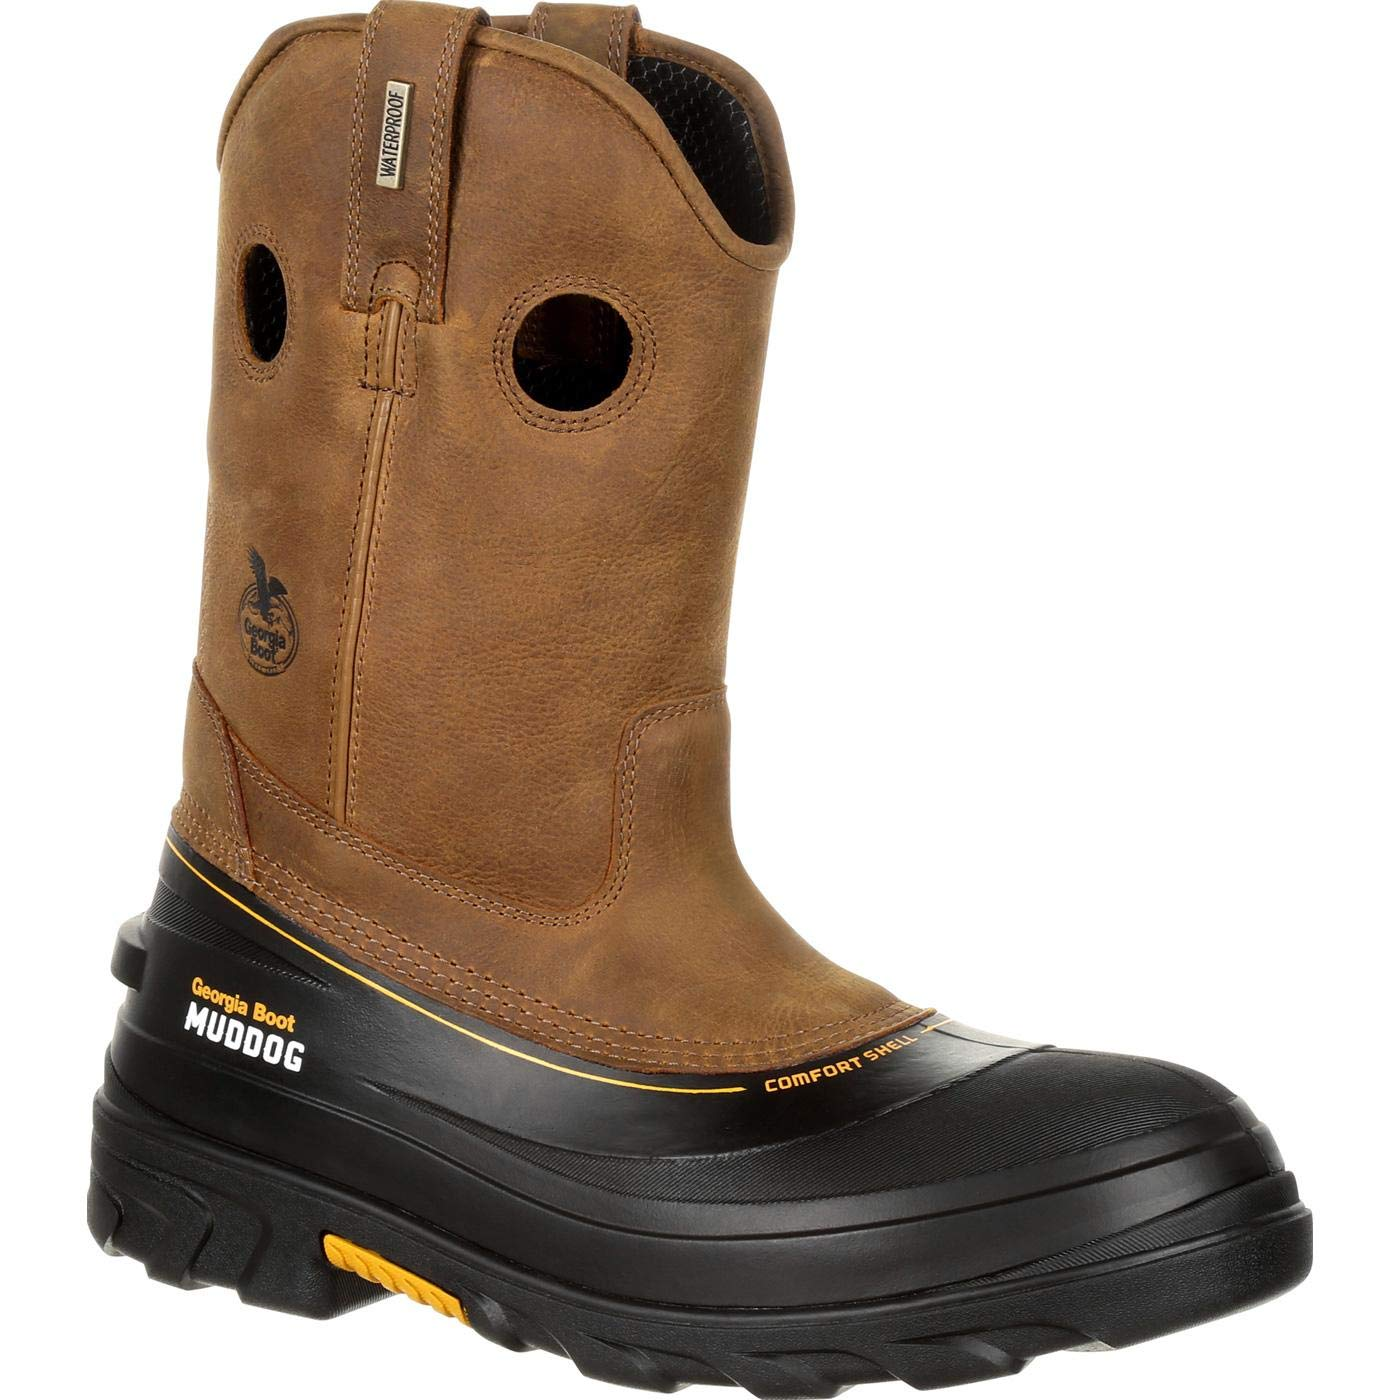 Georgia Boot Muddog Composite Toe Waterproof Work Wellington